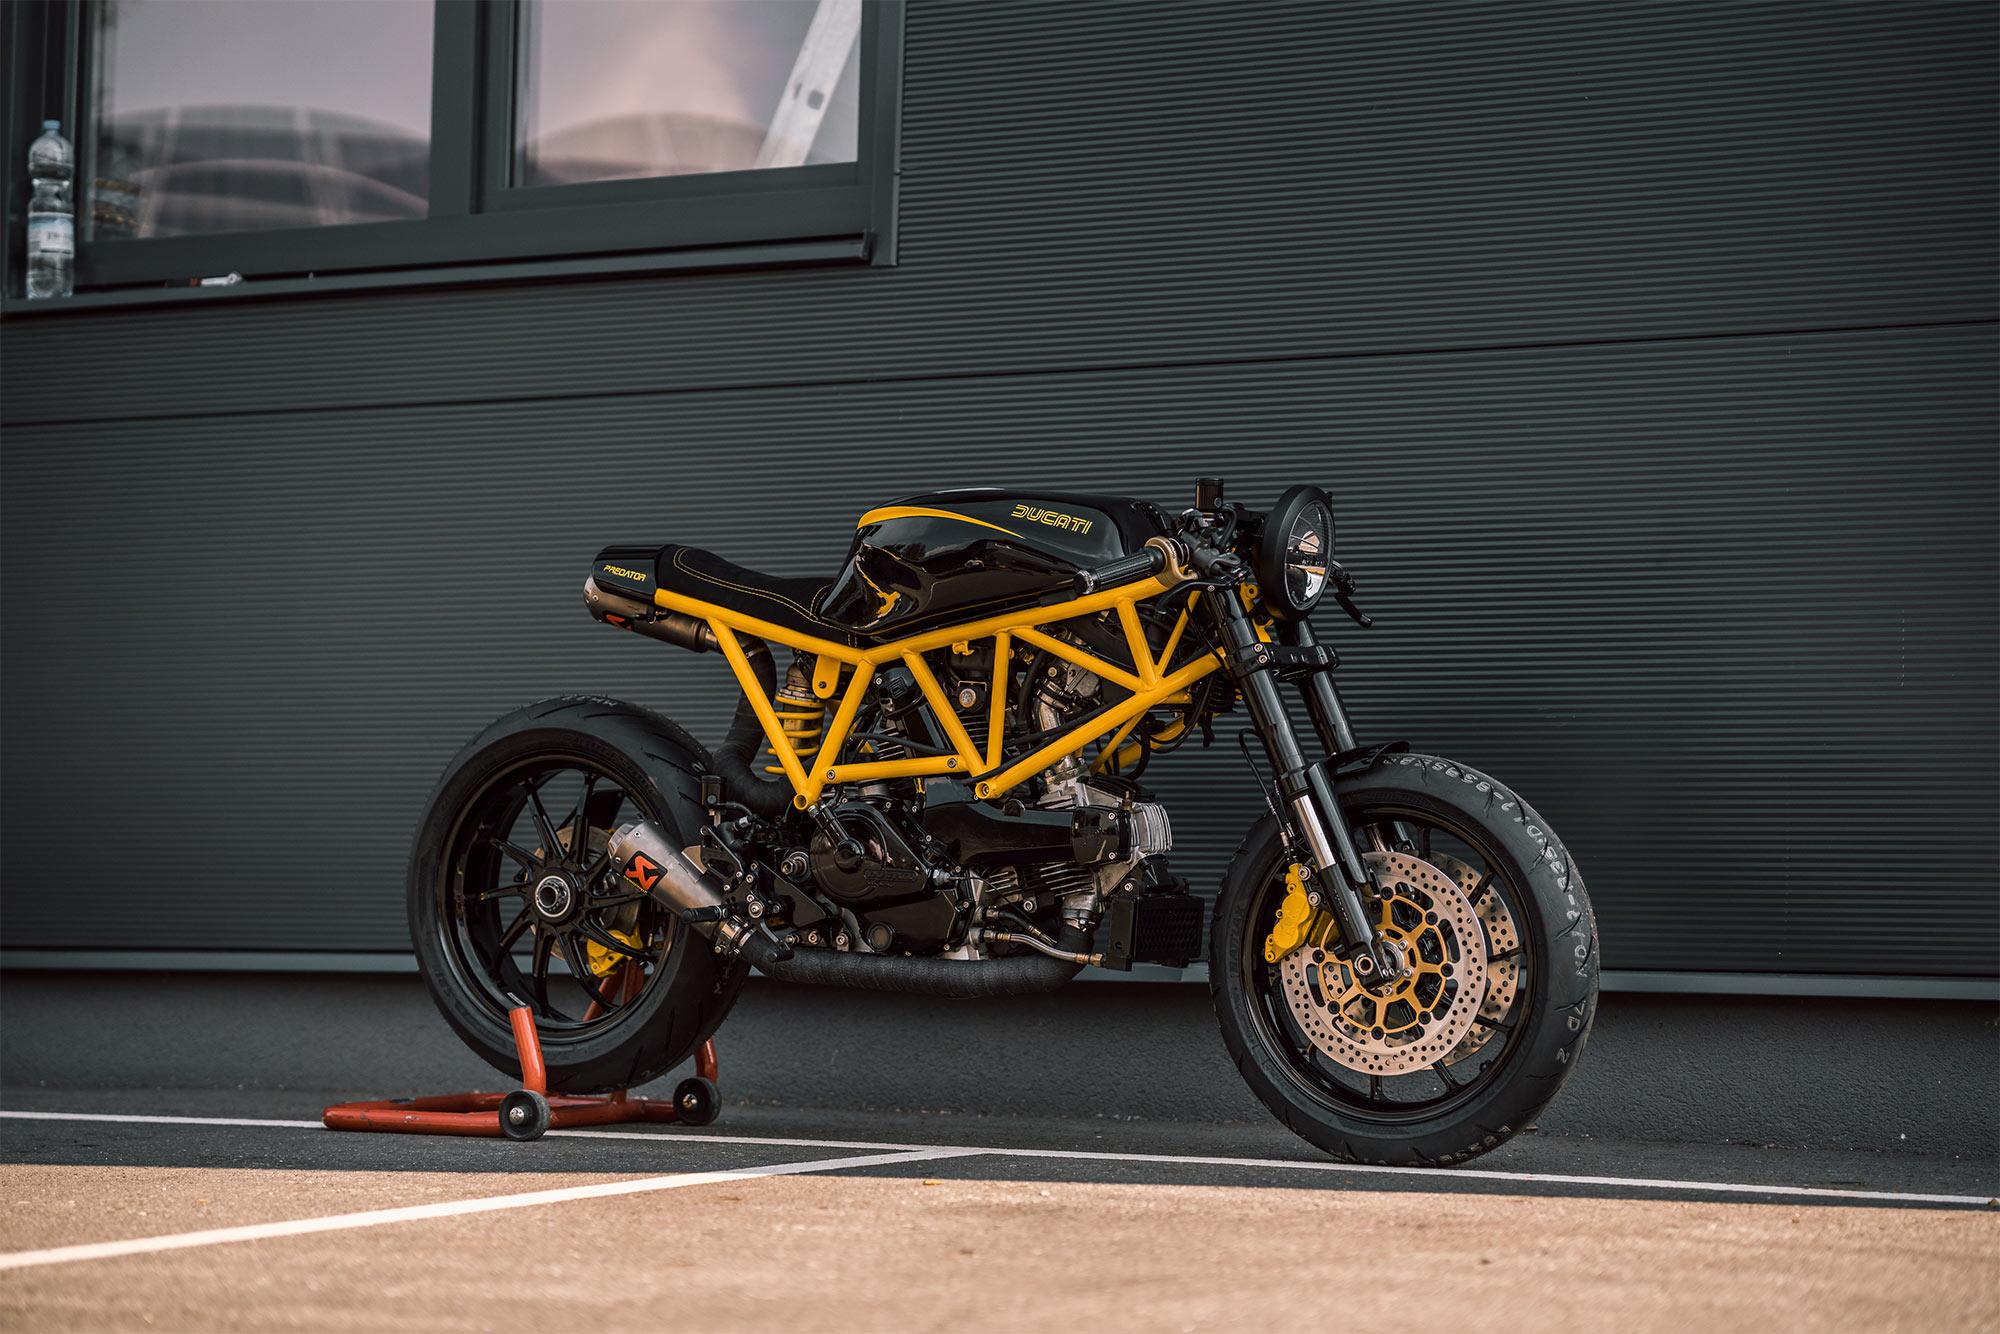 Sting Like A V Nct Motorcycle S Angry Predator Ducati 750ss Pipeburn